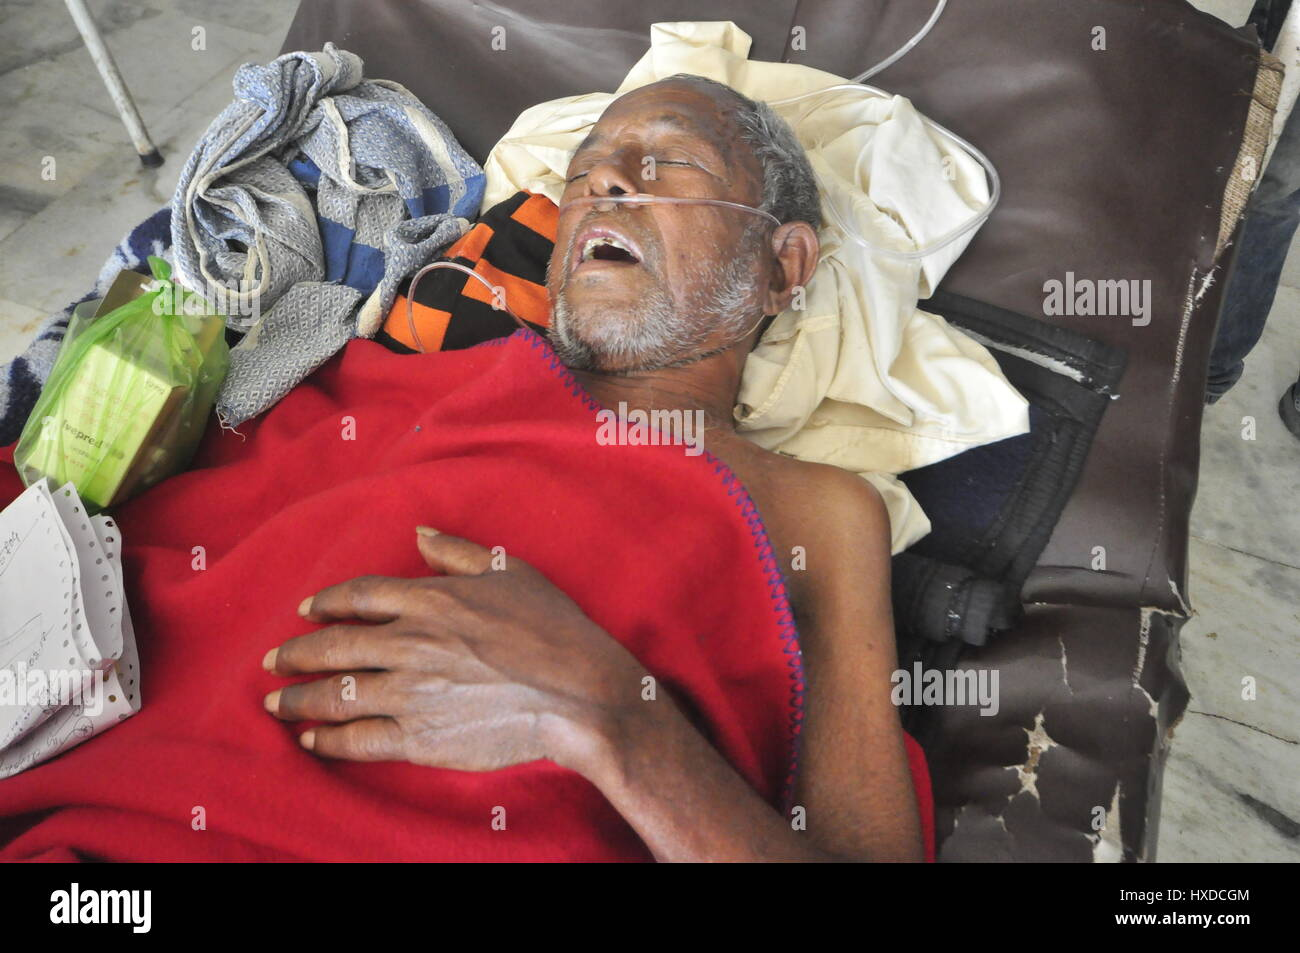 An Indian TB patient -  24/03/2017  -  India / Tripura / Agartala  -  INDIA,TRIPURA-:An Indian TB patient is struggling - Stock Image